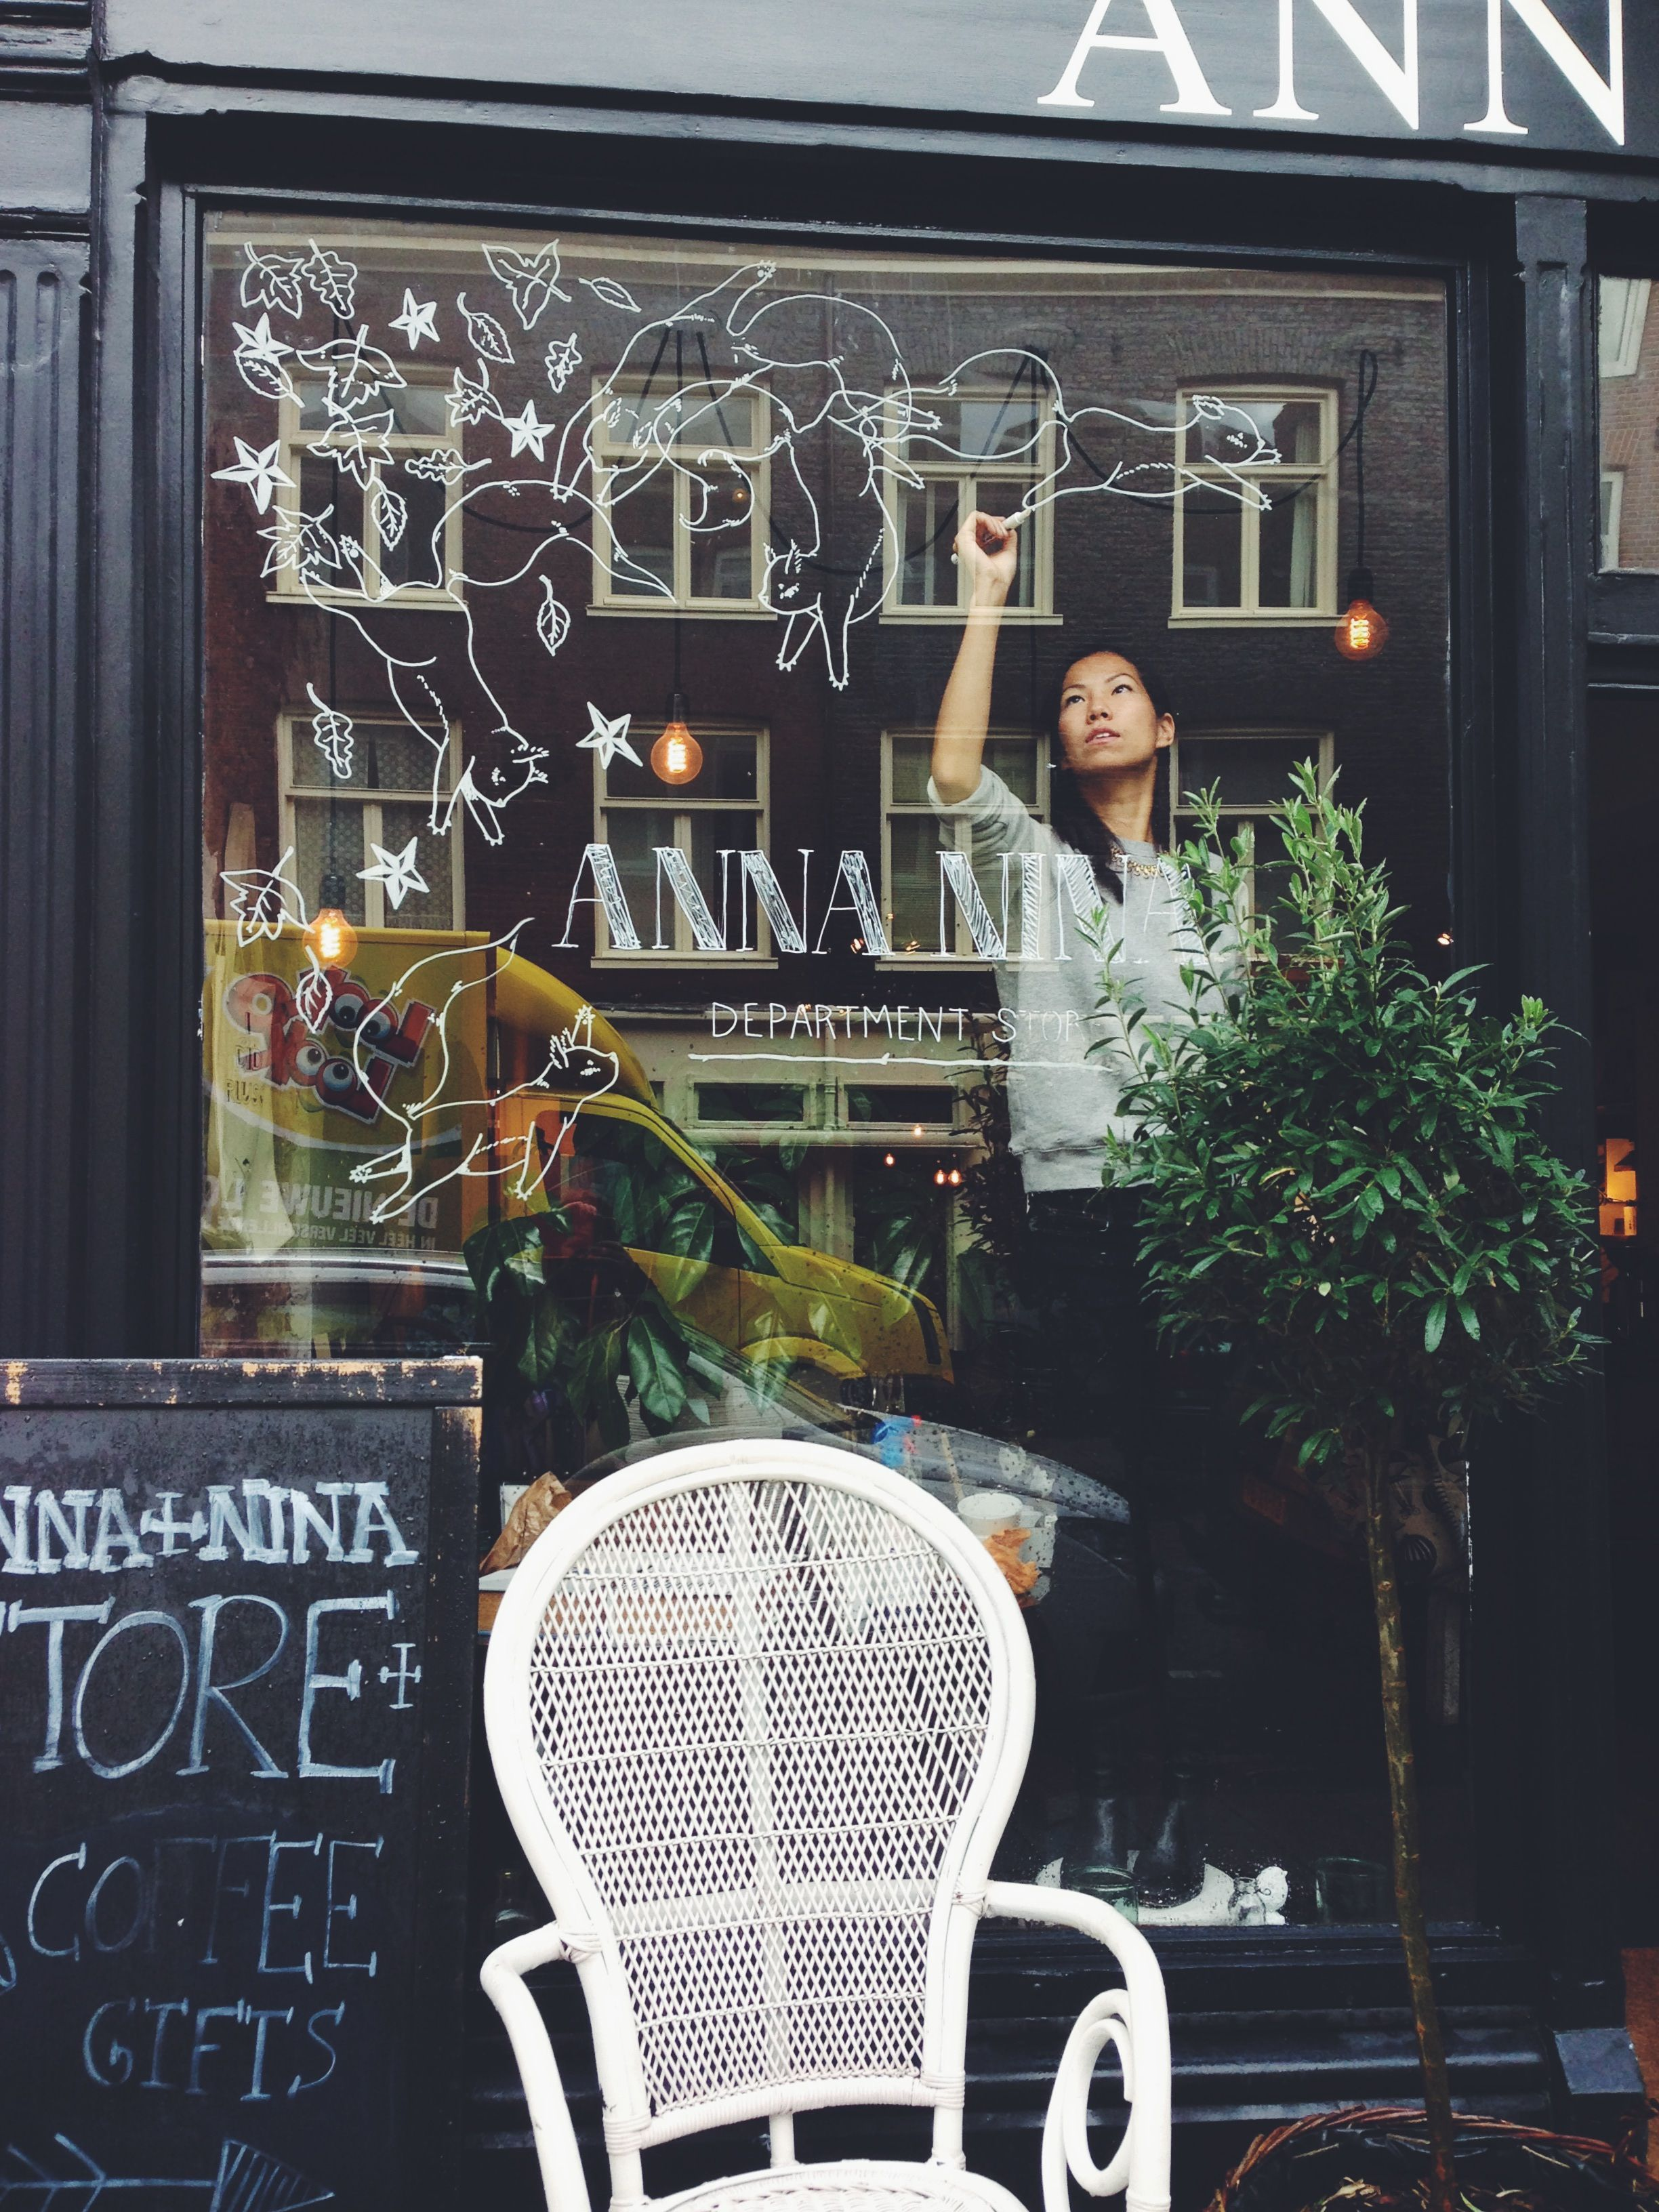 Pin Van Sanne Boerema Op Amsterdam ️ Etalage Ramen En